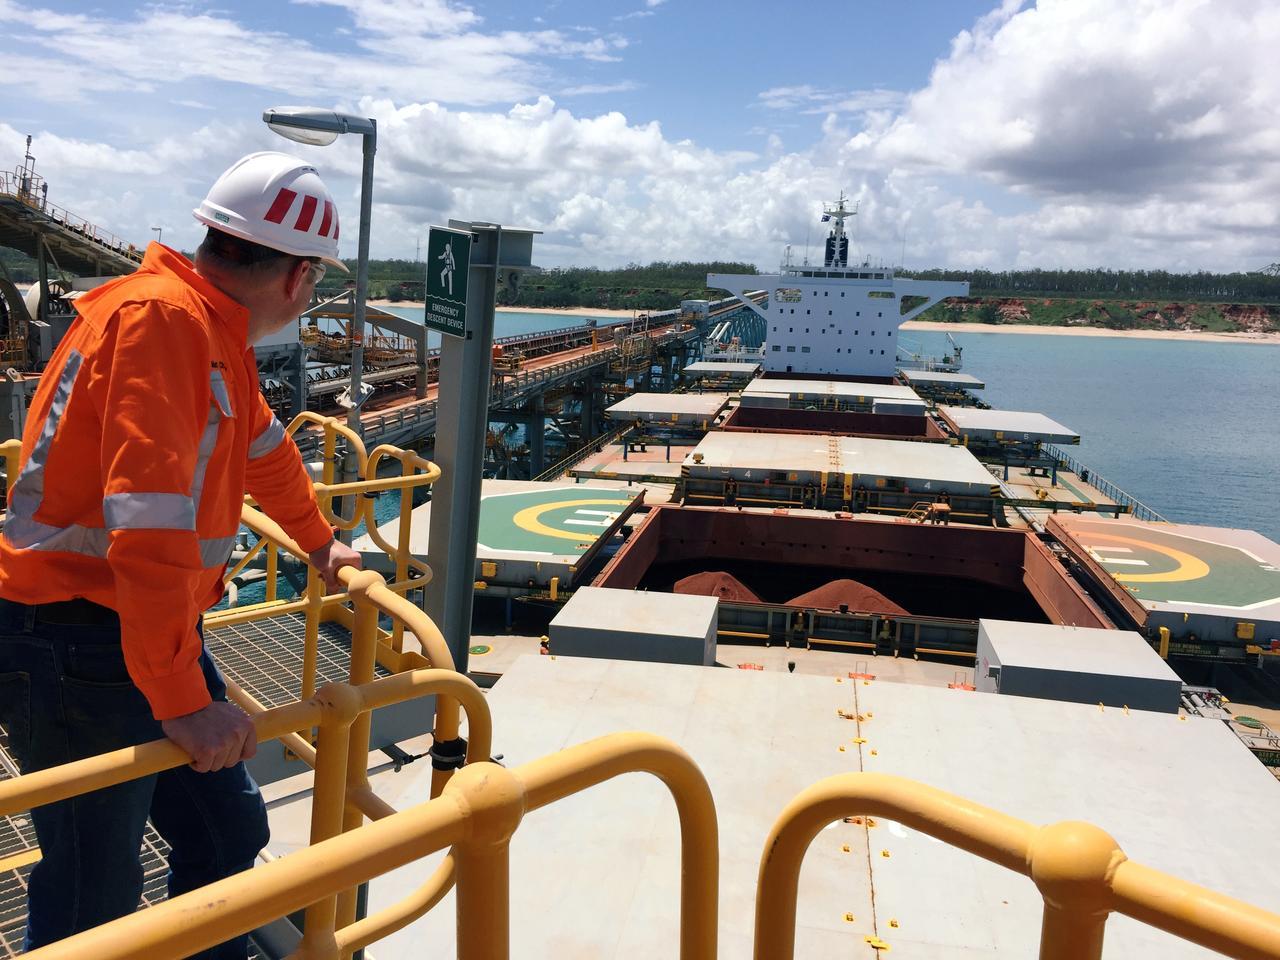 Column: Rio Tinto warning may rupture mining industry into